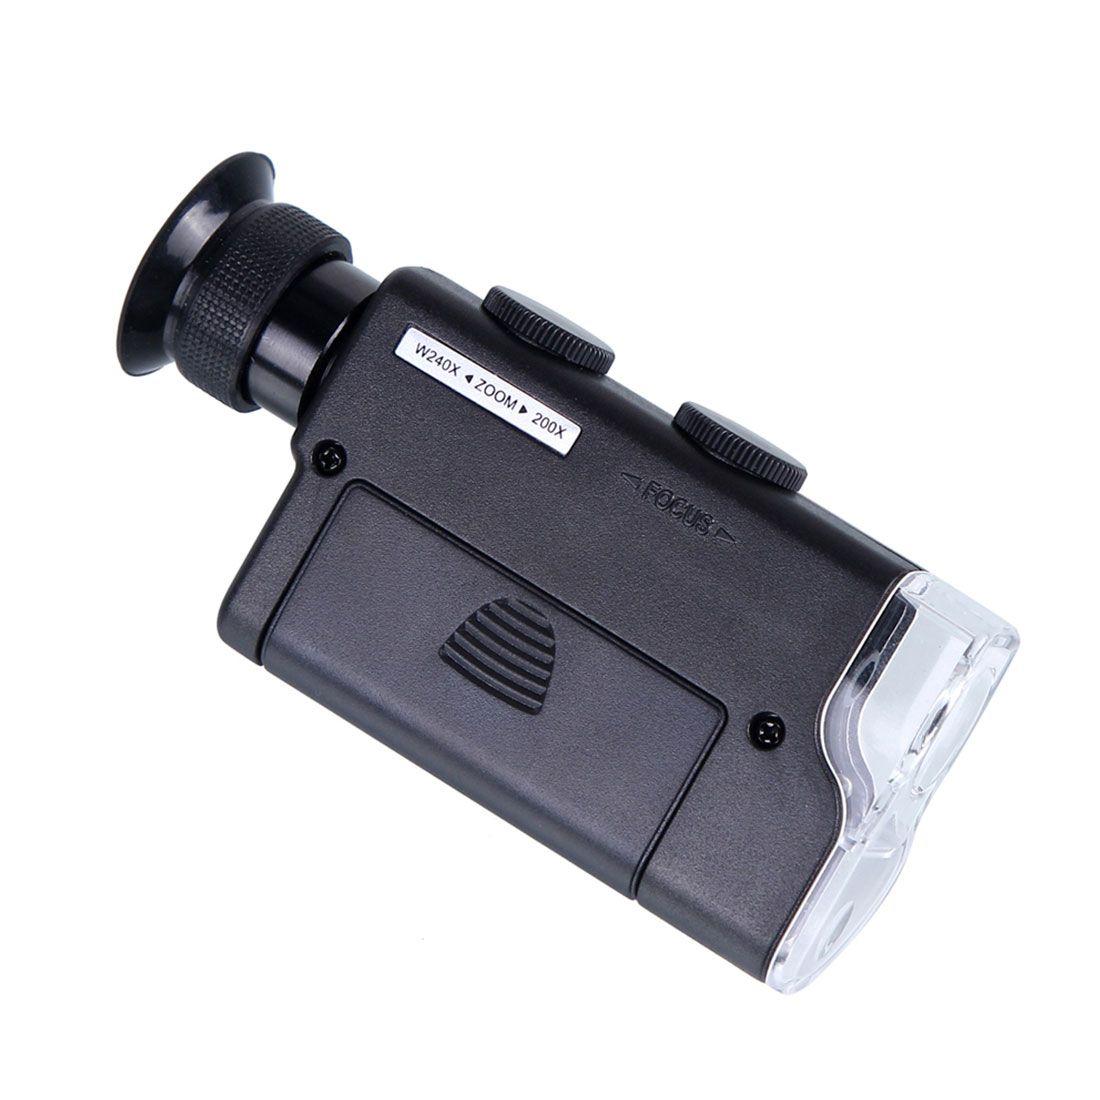 Mini Portable Microscope Pocket 200x 240x Handheld Led Lamp Light Loupe Zoom Magnifier Magnifying Glass Pocket Le Pocket Microscope Lamp Light Magnifying Glass